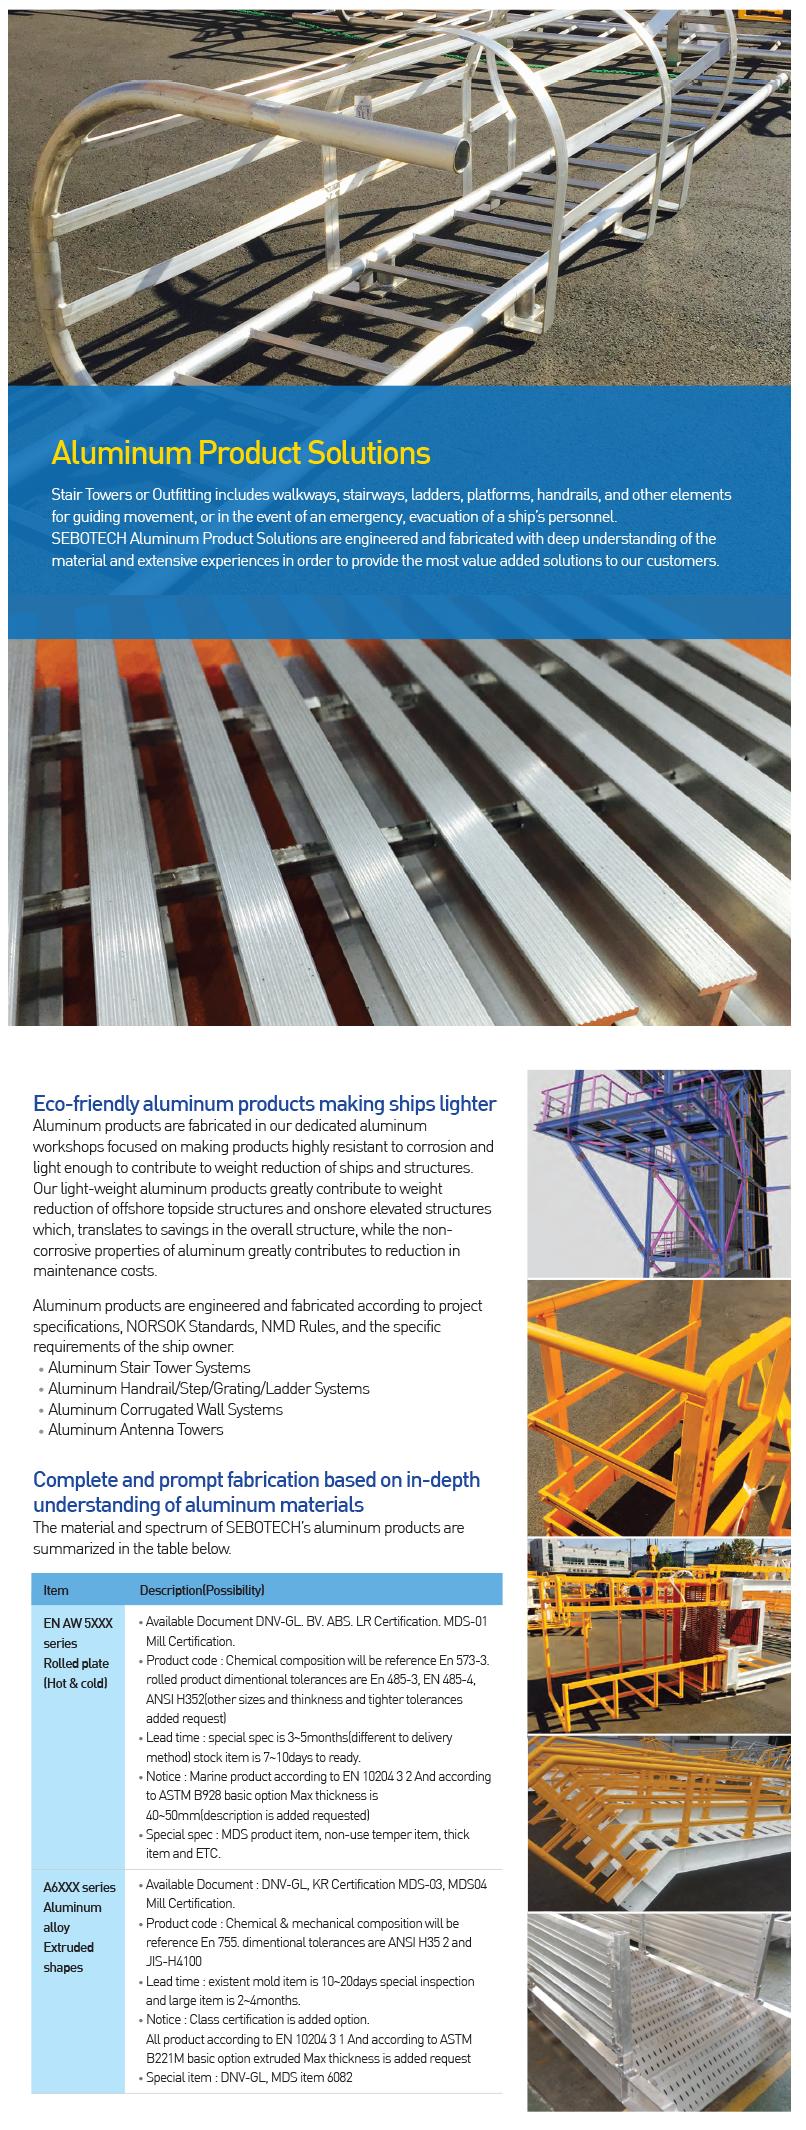 SEBOTECH Aluminum Product Solutions